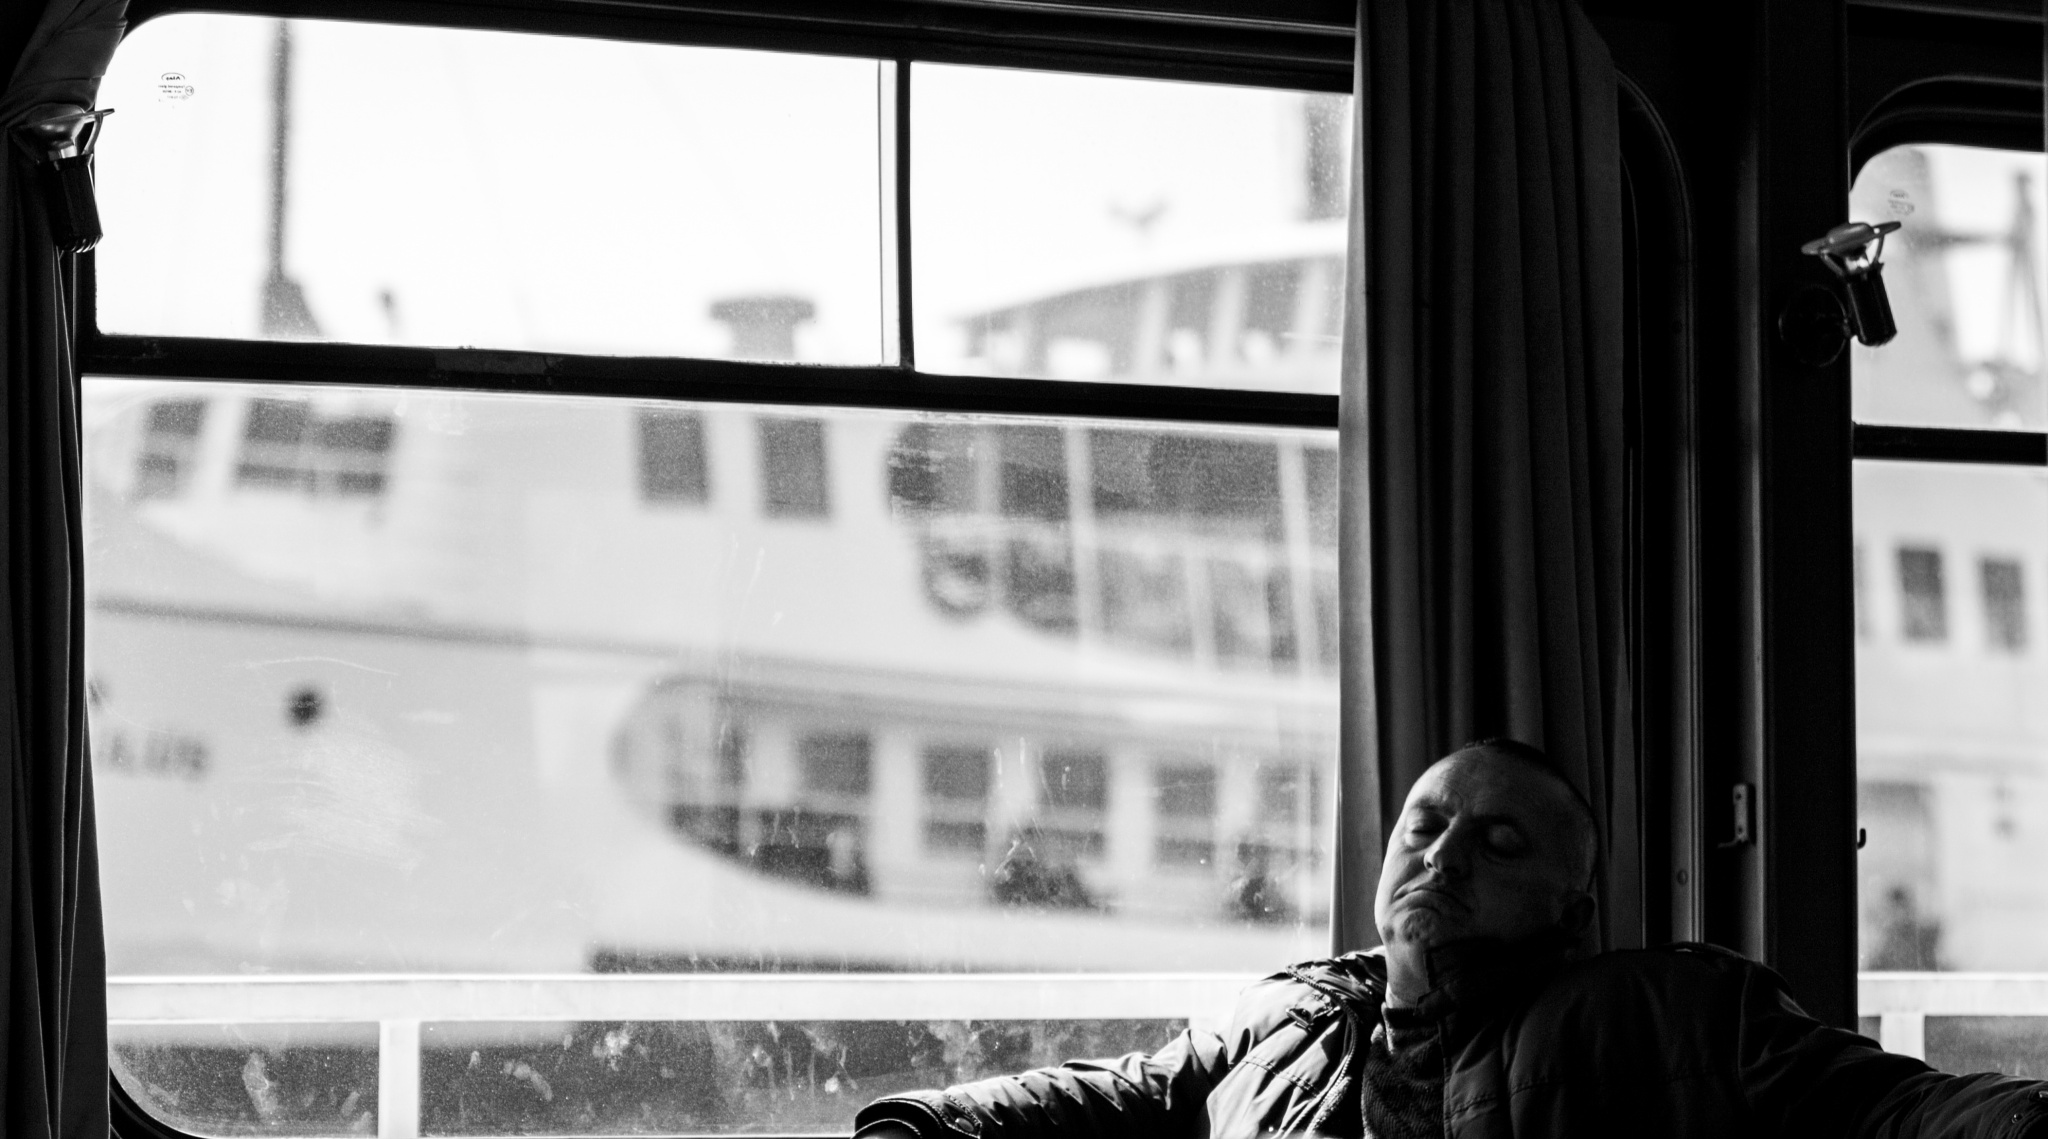 nap by Kutlay Yegen